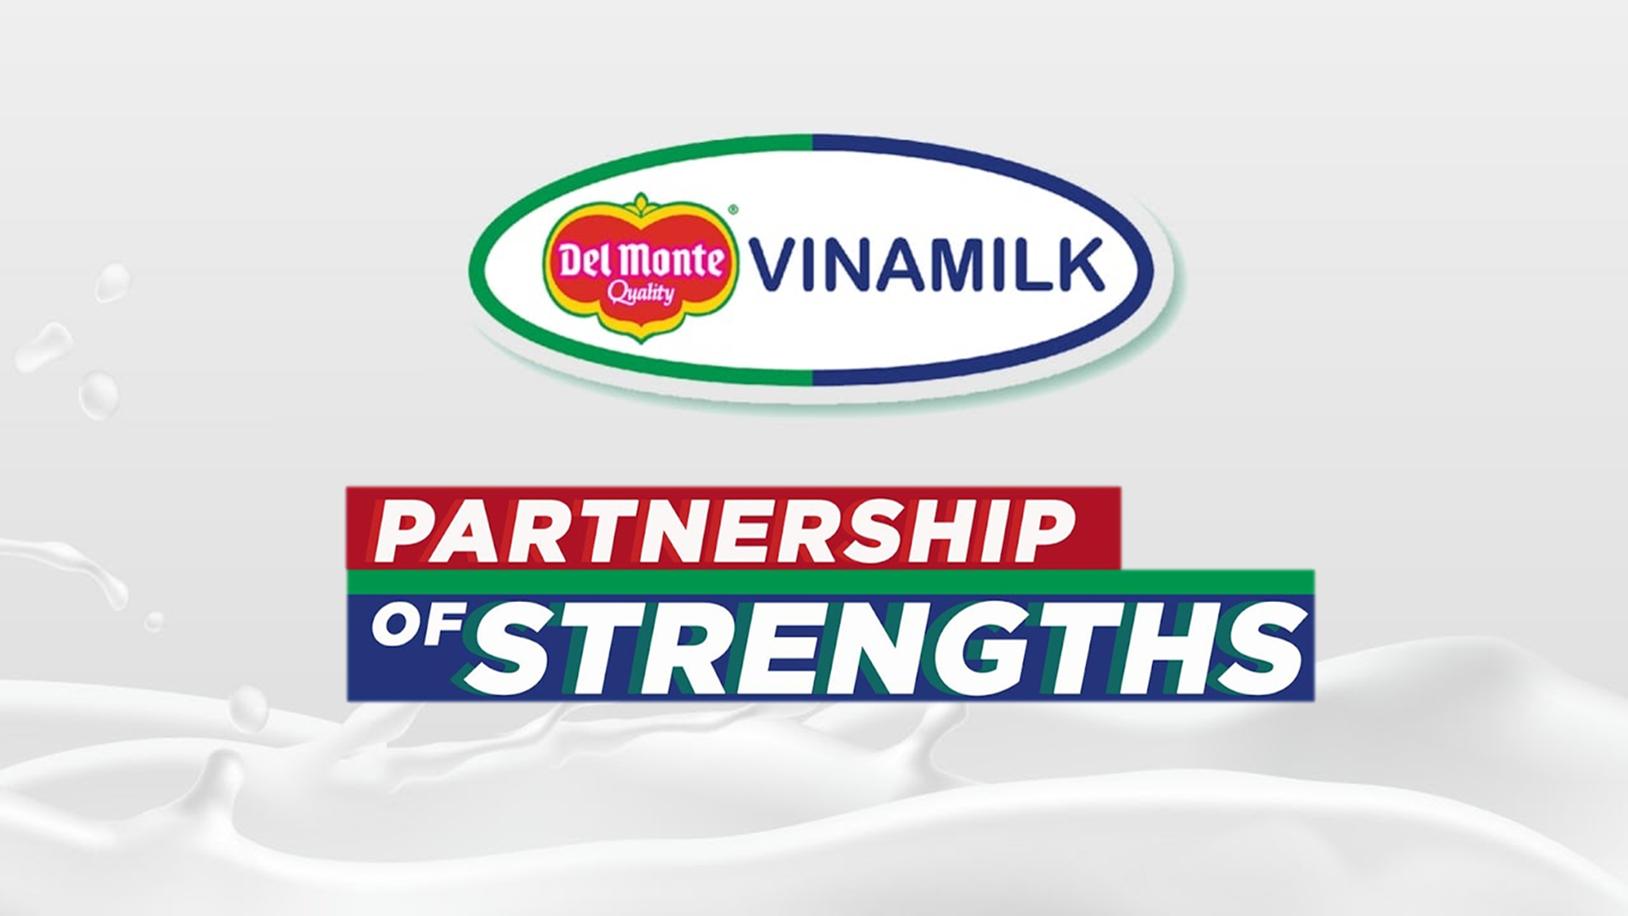 Vinamilk establishes dairy joint venture with Del Monte Philippines